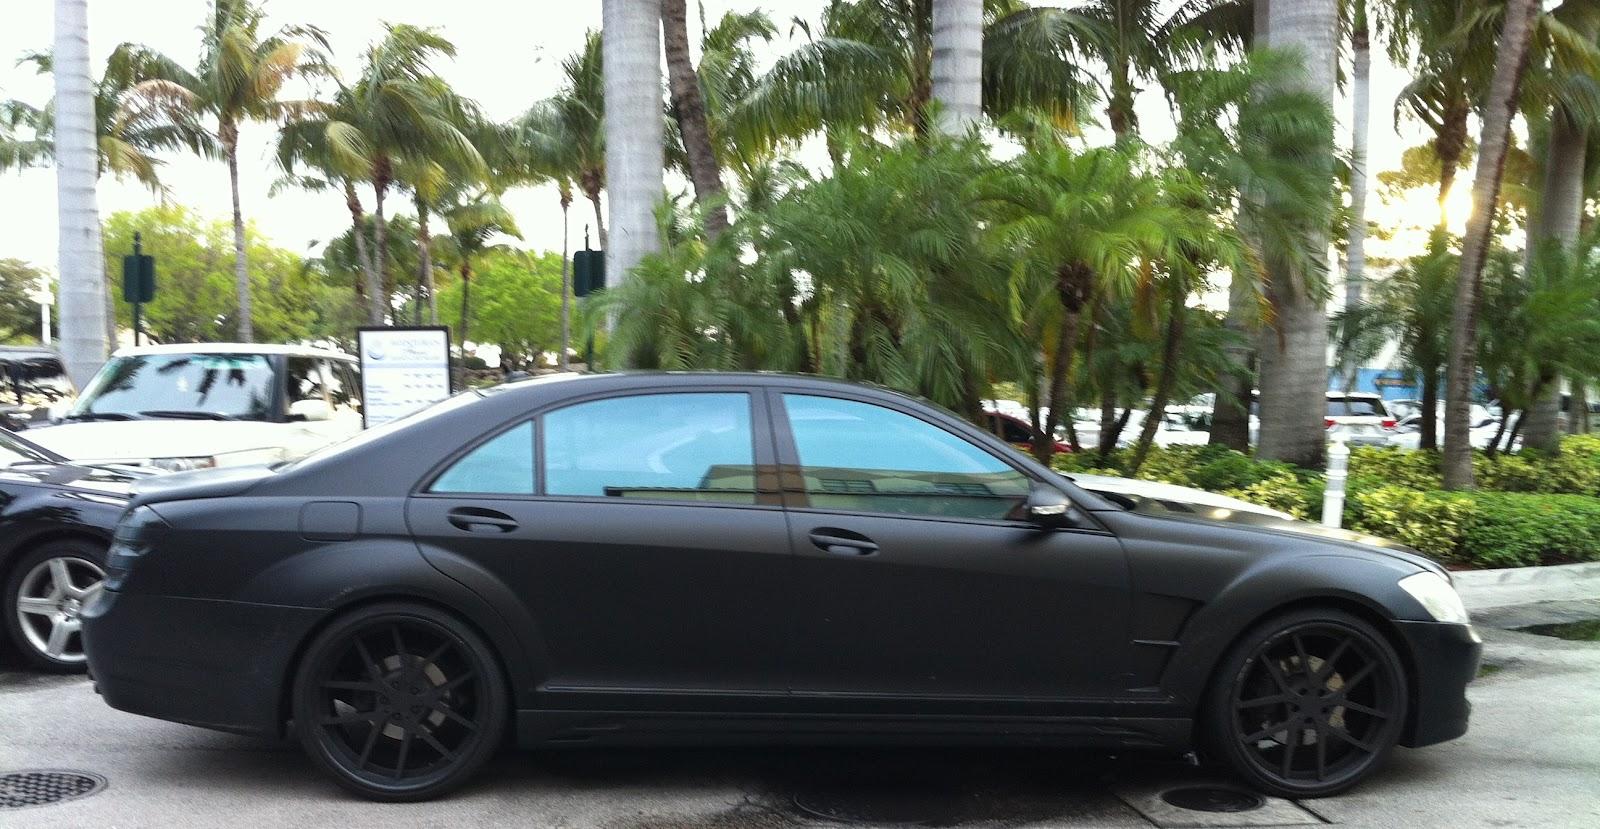 100 mercedes jeep matte black the new mercedes benz for Matte black mercedes benz